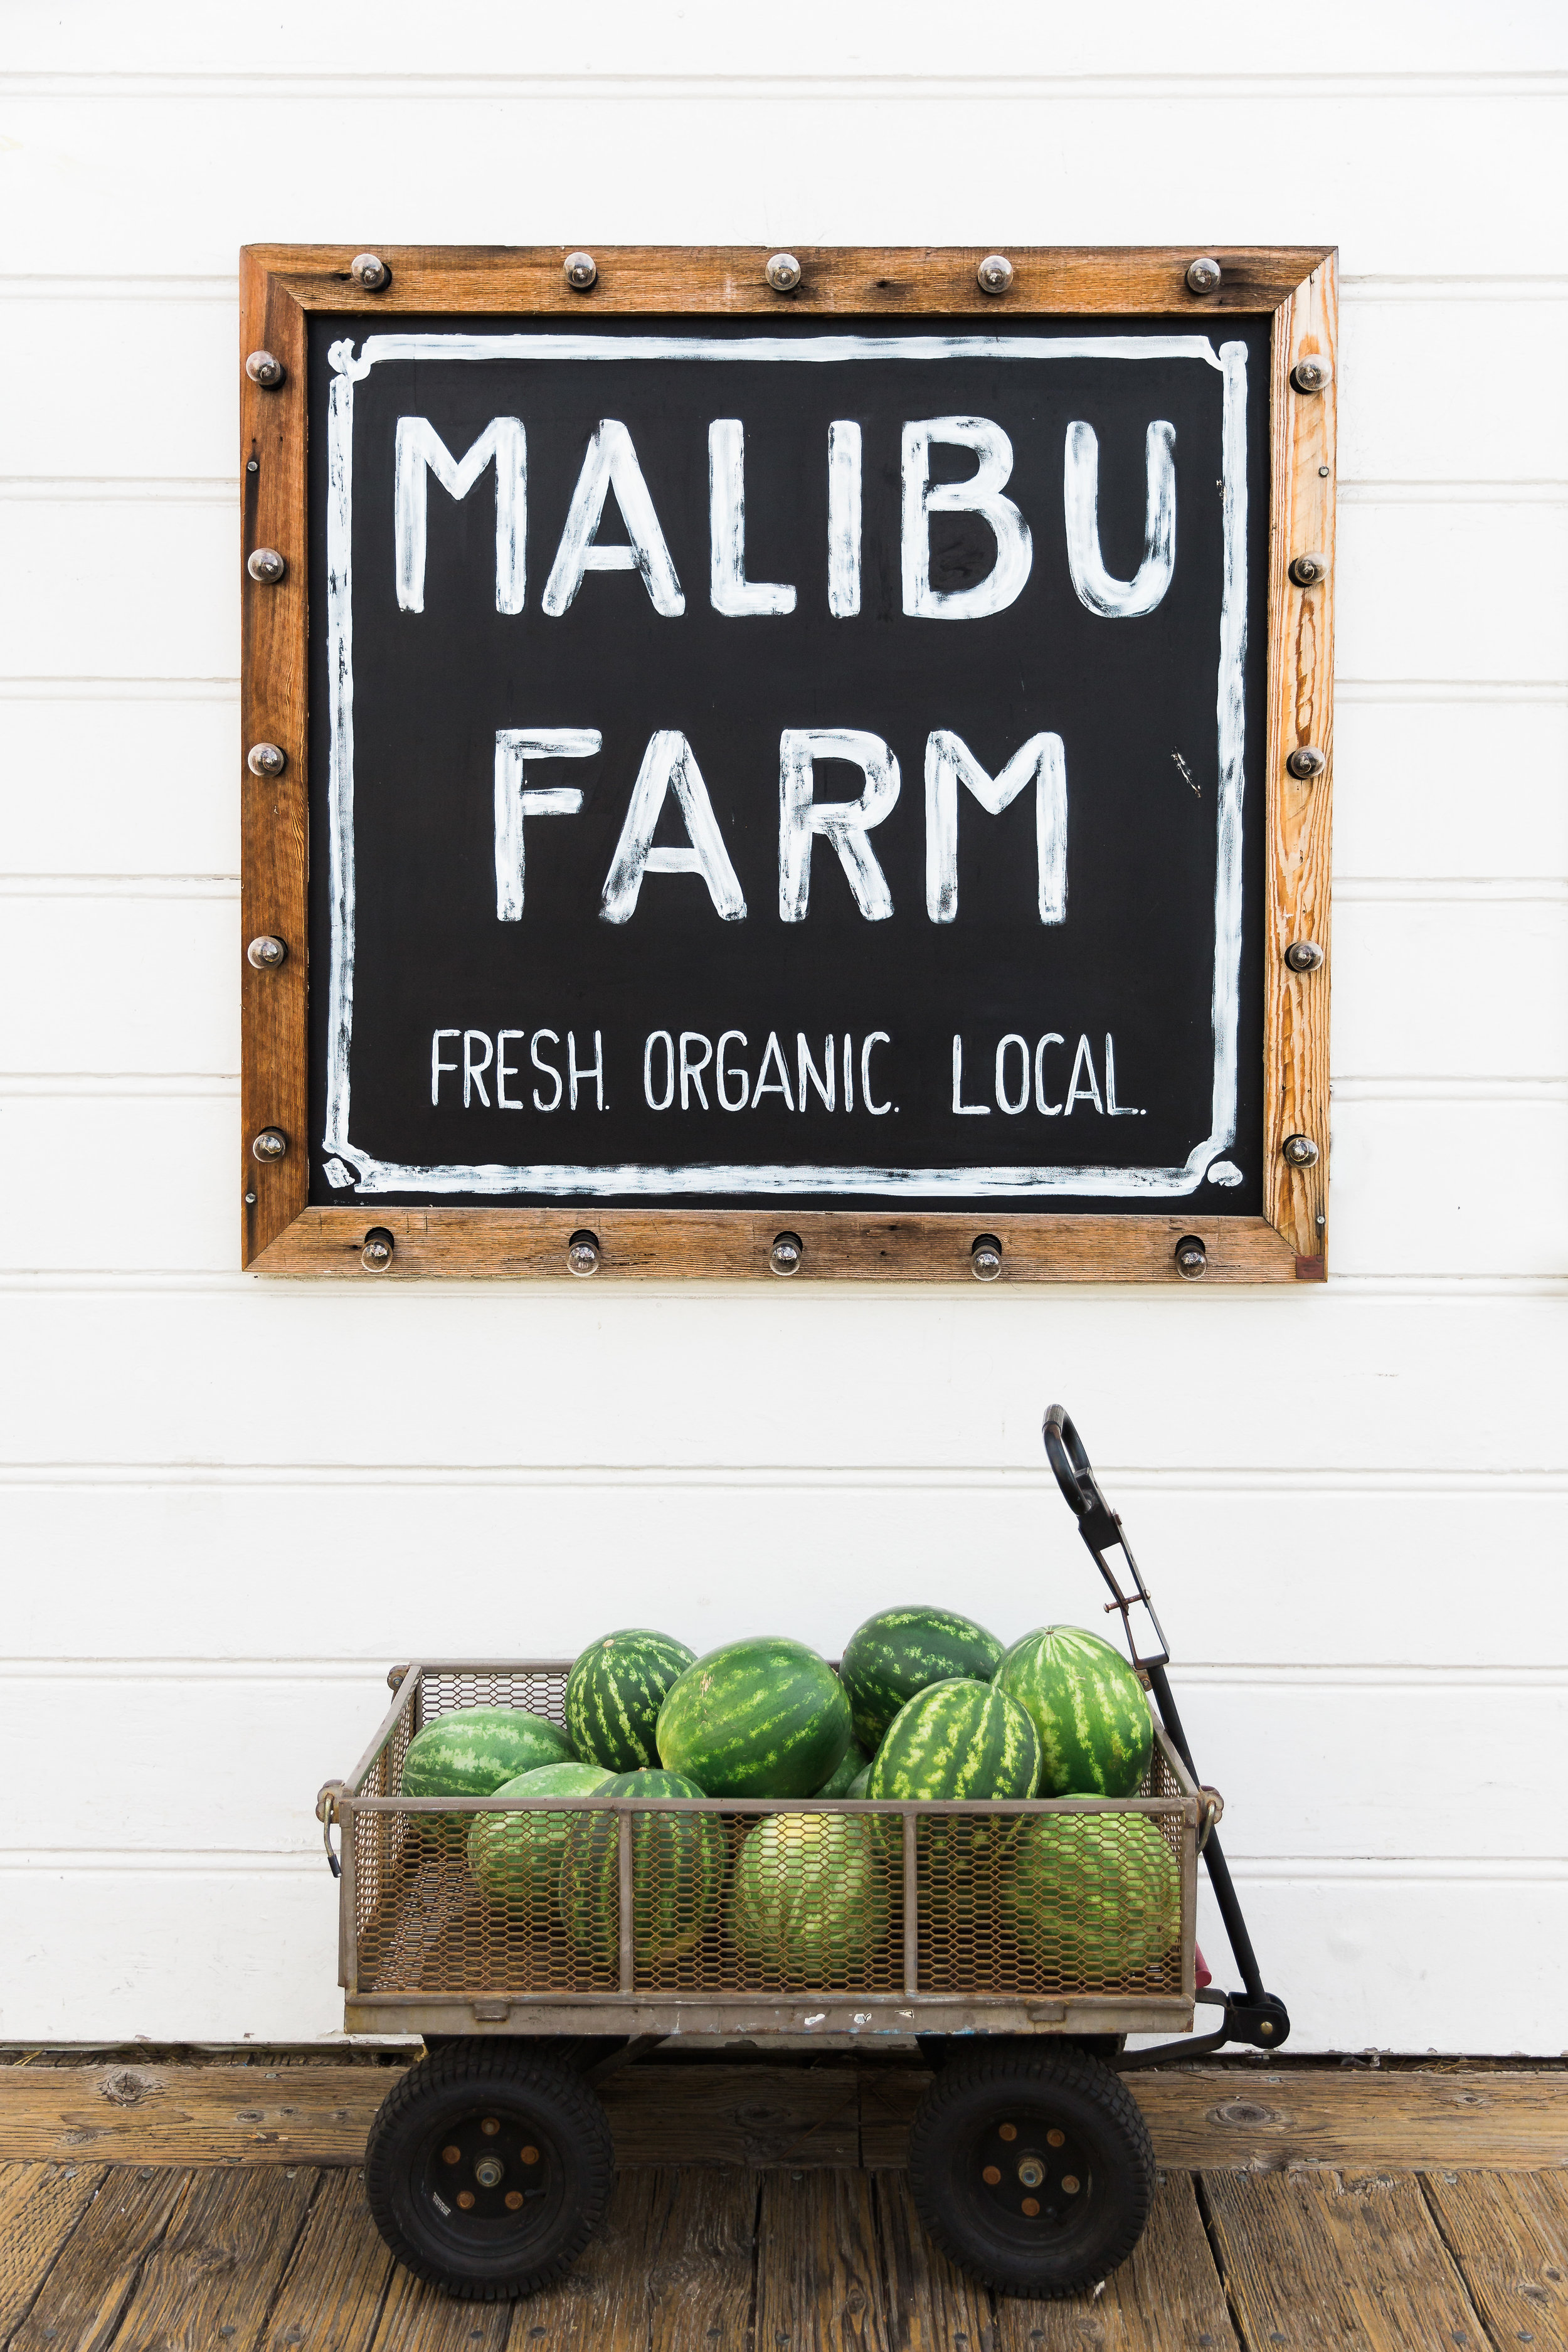 MalibuMagJW-MalibuFarm-3.jpg